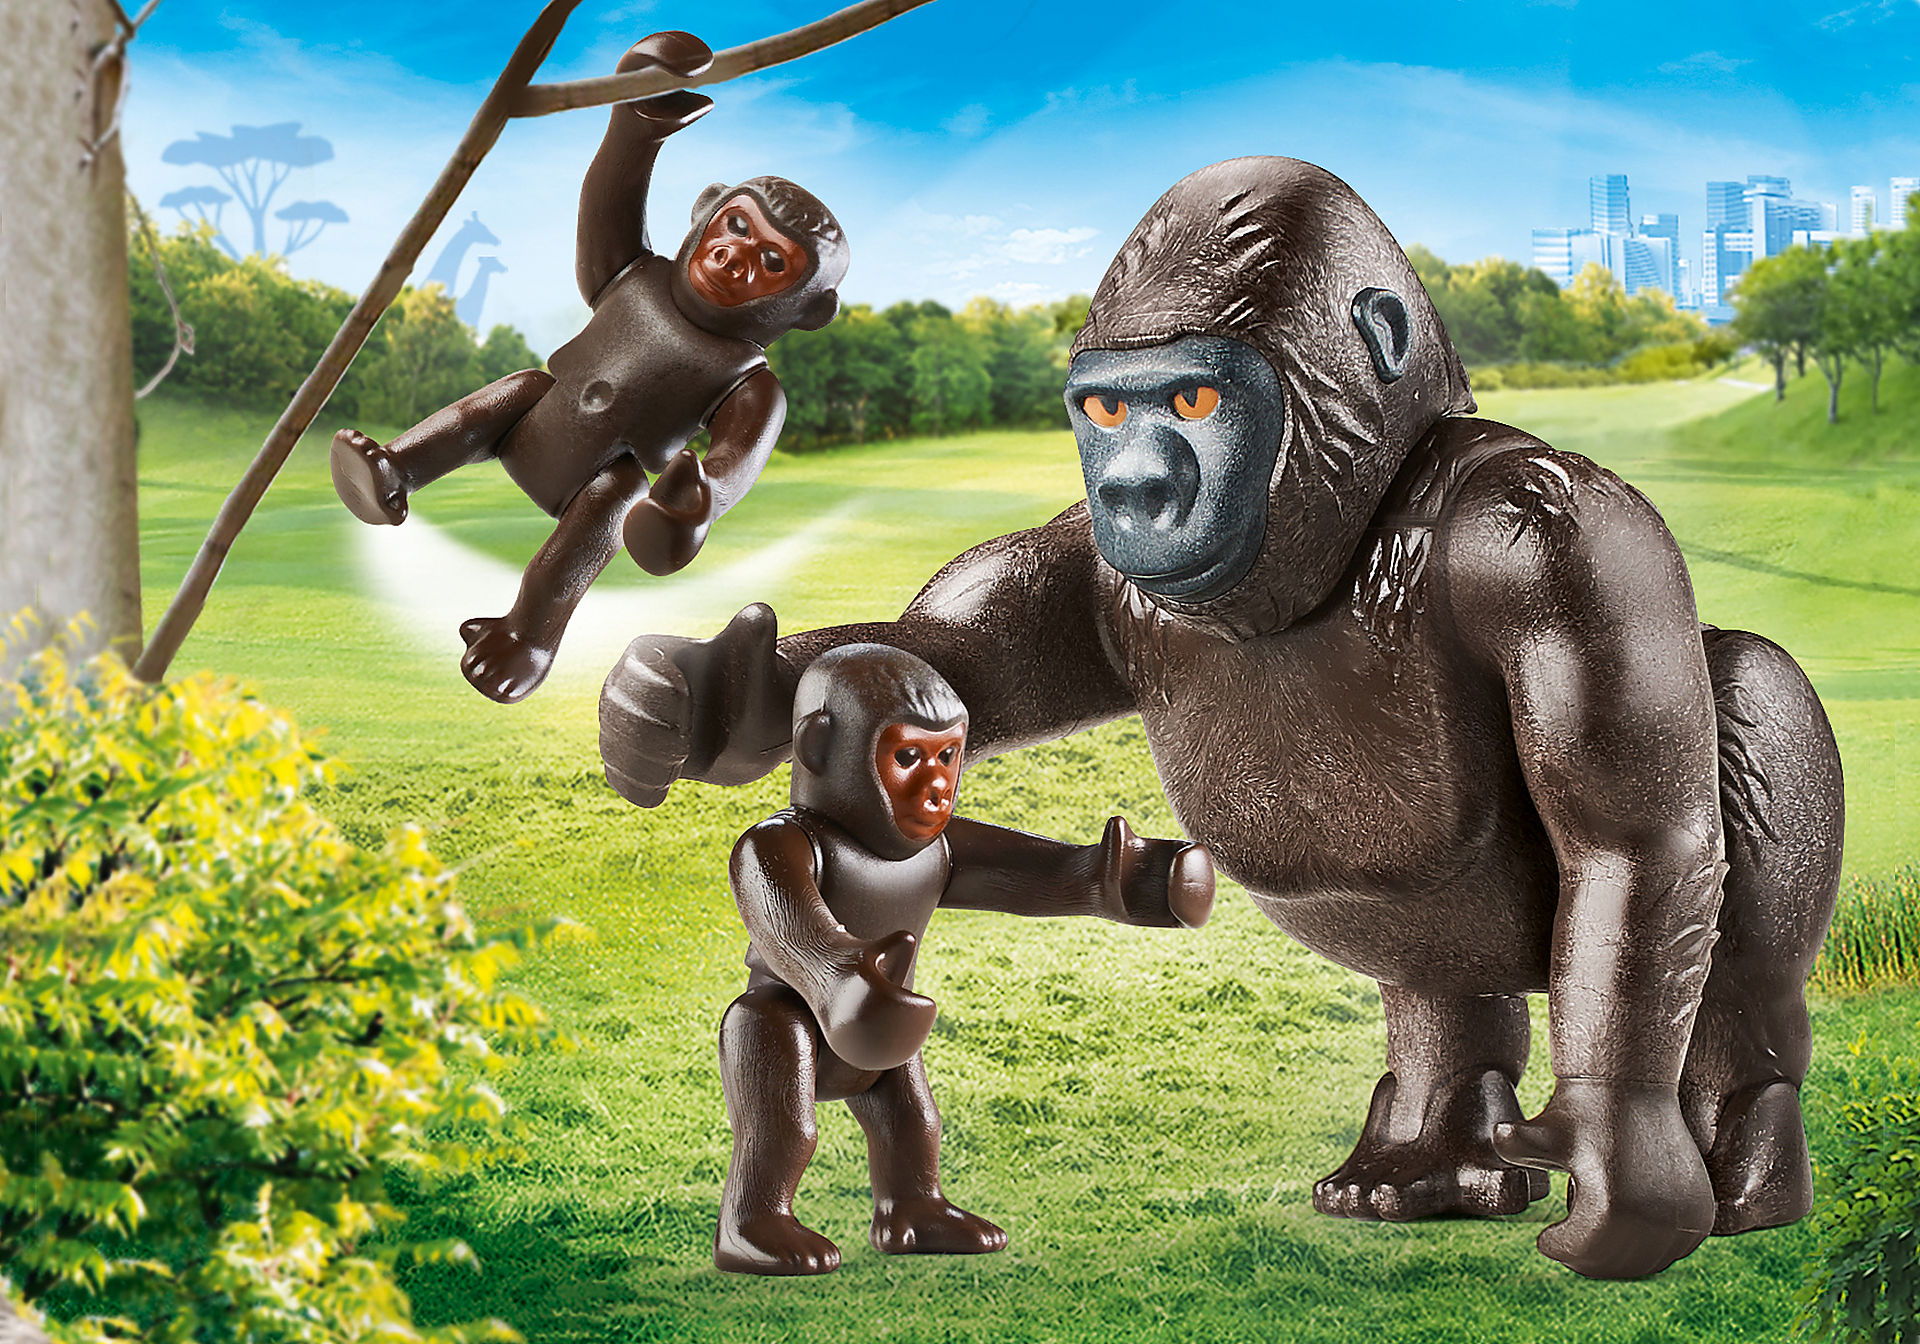 70360 Gorilla kicsinyeivel zoom image1